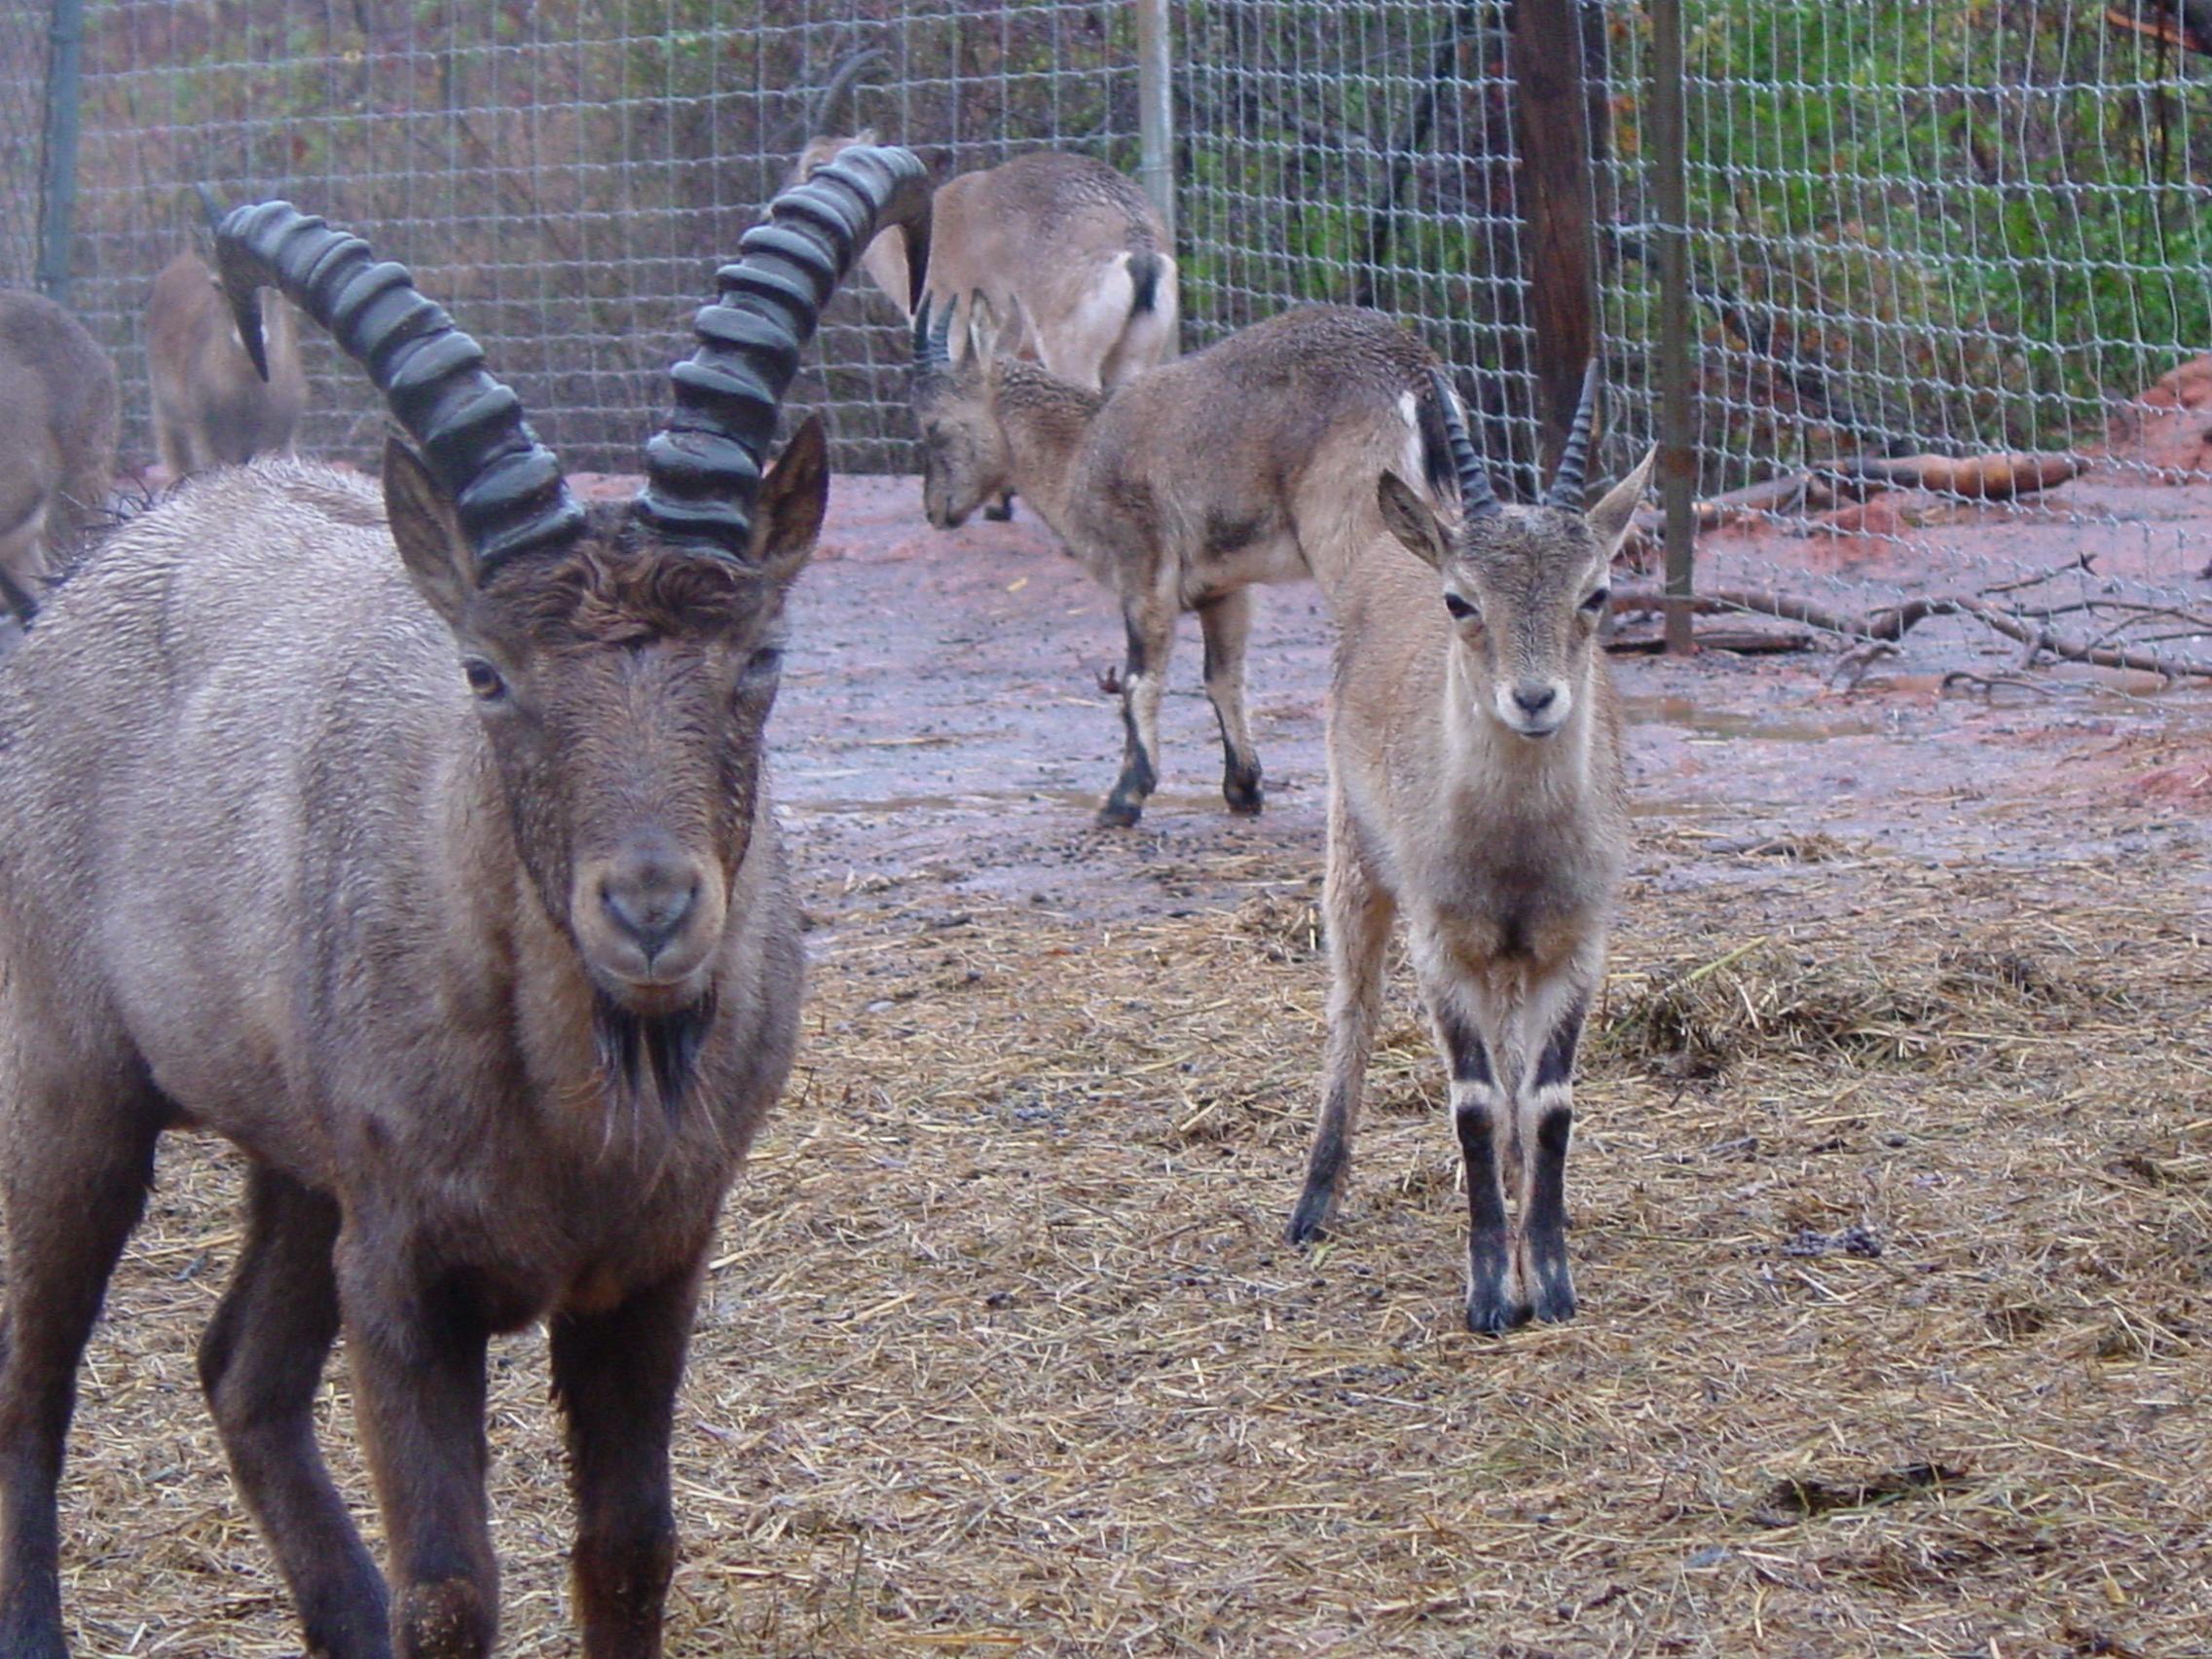 Pics of Turs and Ibex 11-30-10 002